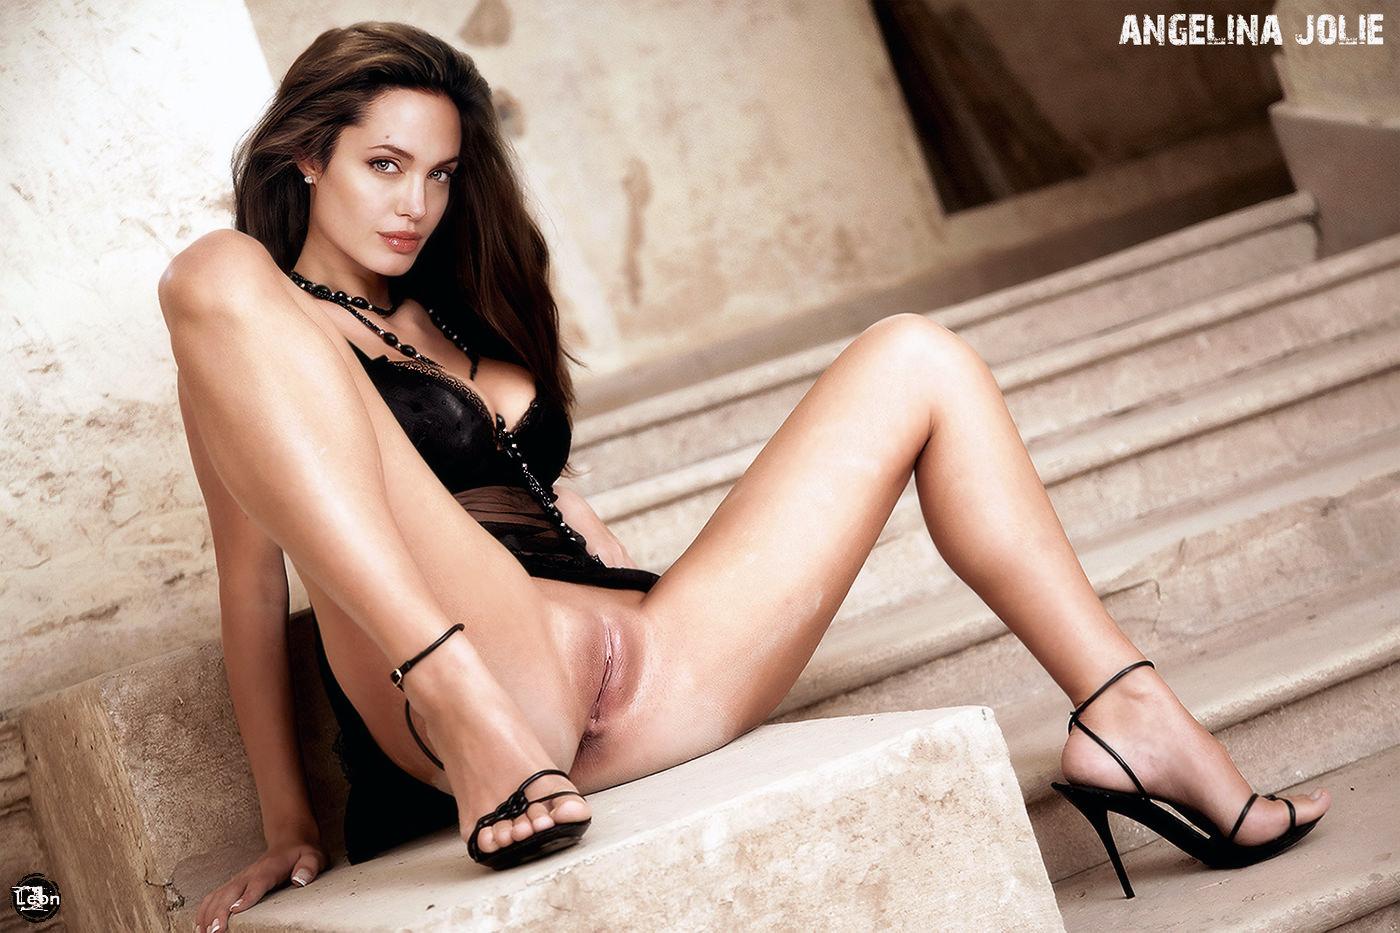 Free naked angelina jolie pics